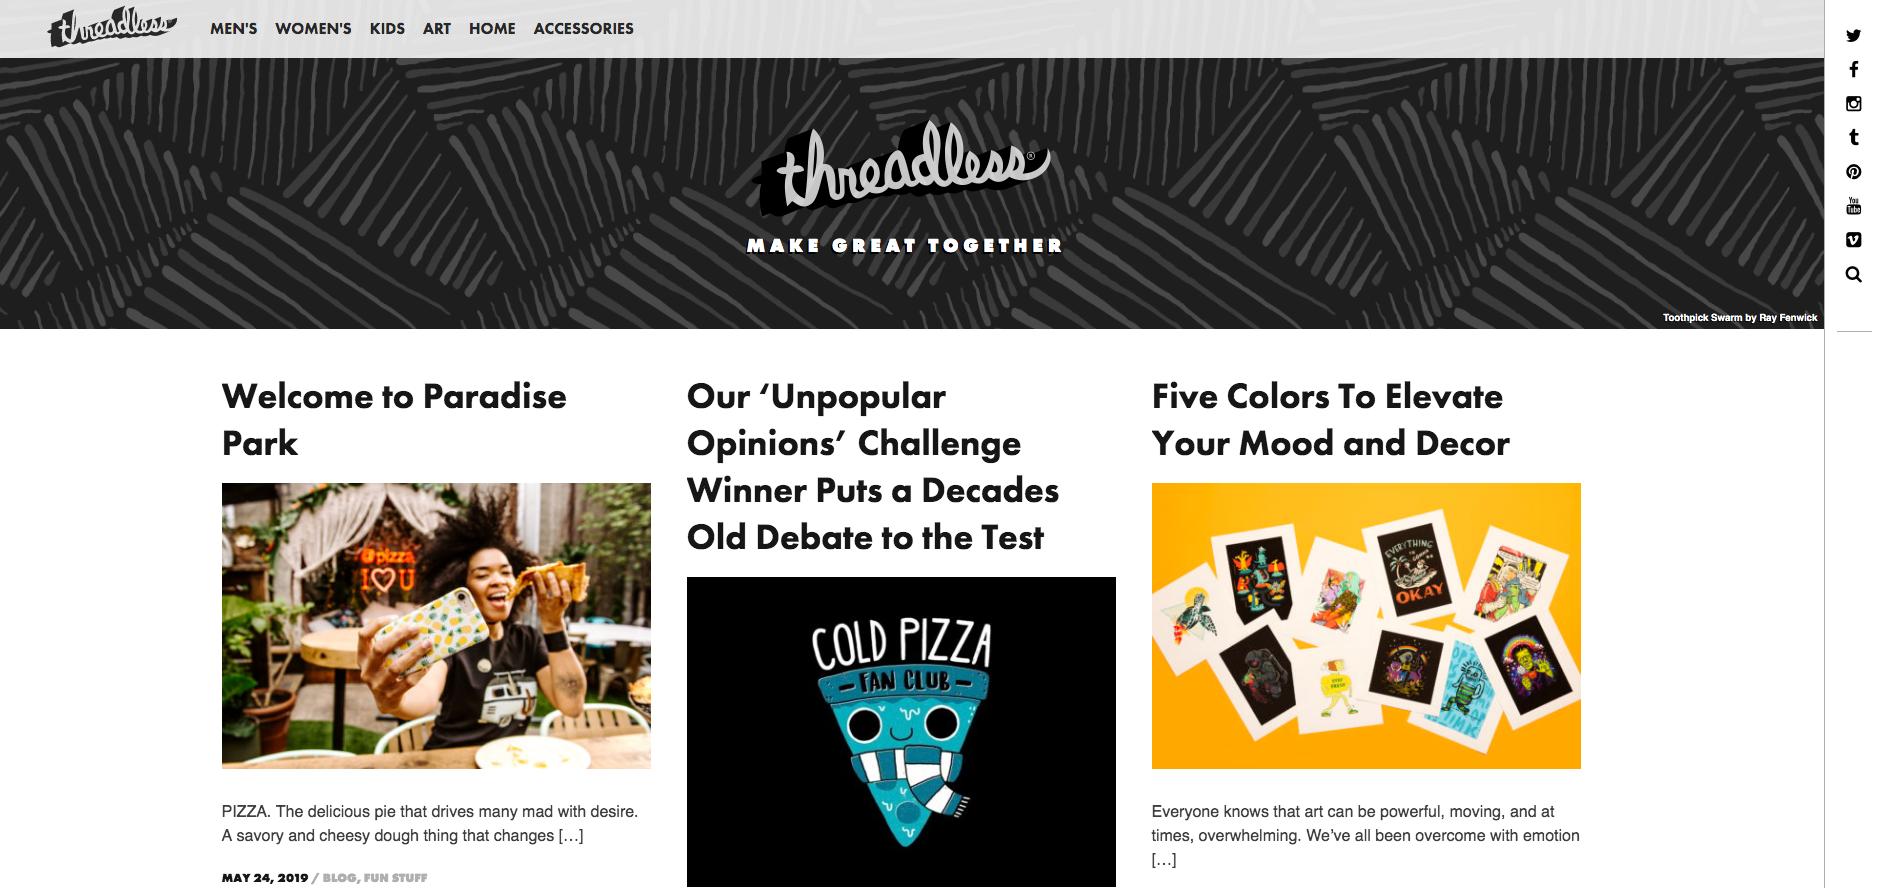 Threadless Company's Blog